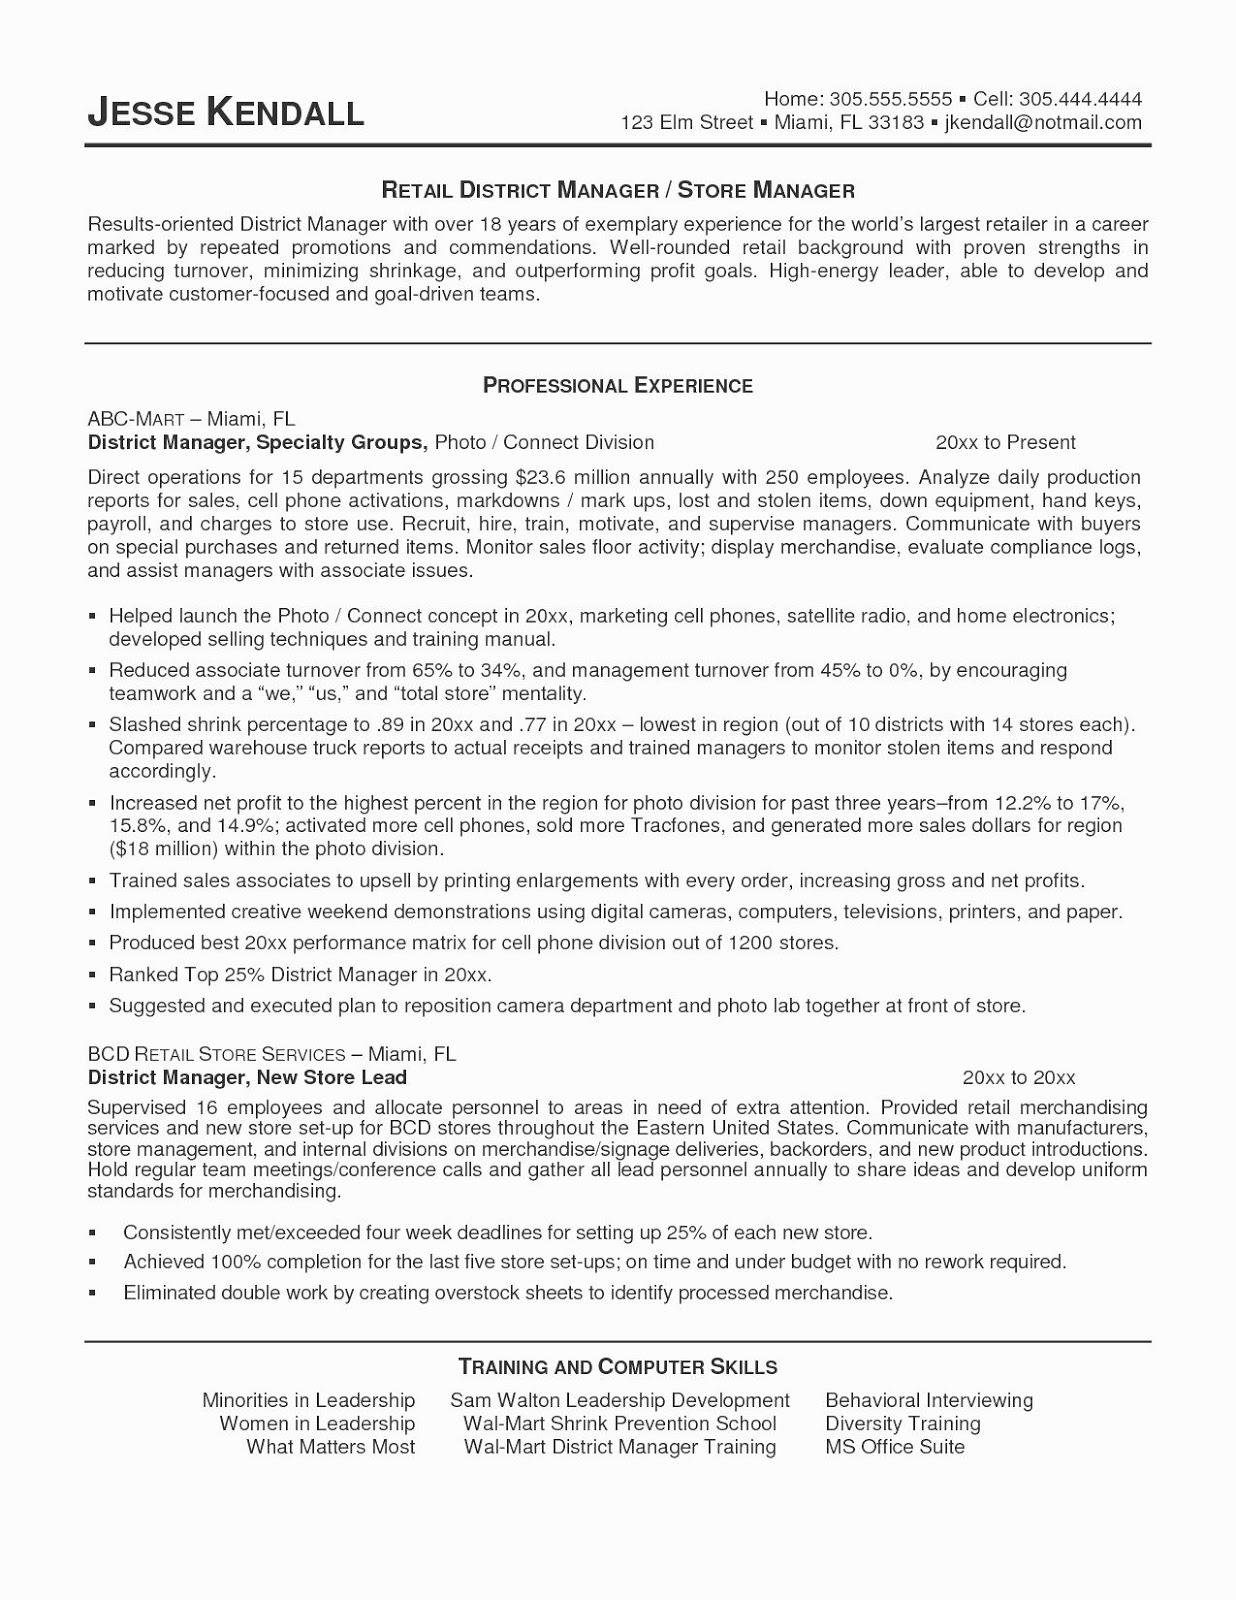 warehouse jobs resume sample 2019 warehouse jobs resume objective 2020 warehouse jobs resume skills Warehouse Jobs Resume Sample 2019 Warehouse Jobs Objective 2020 warehousing jobs resume warehouse work resume warehouse work resume example